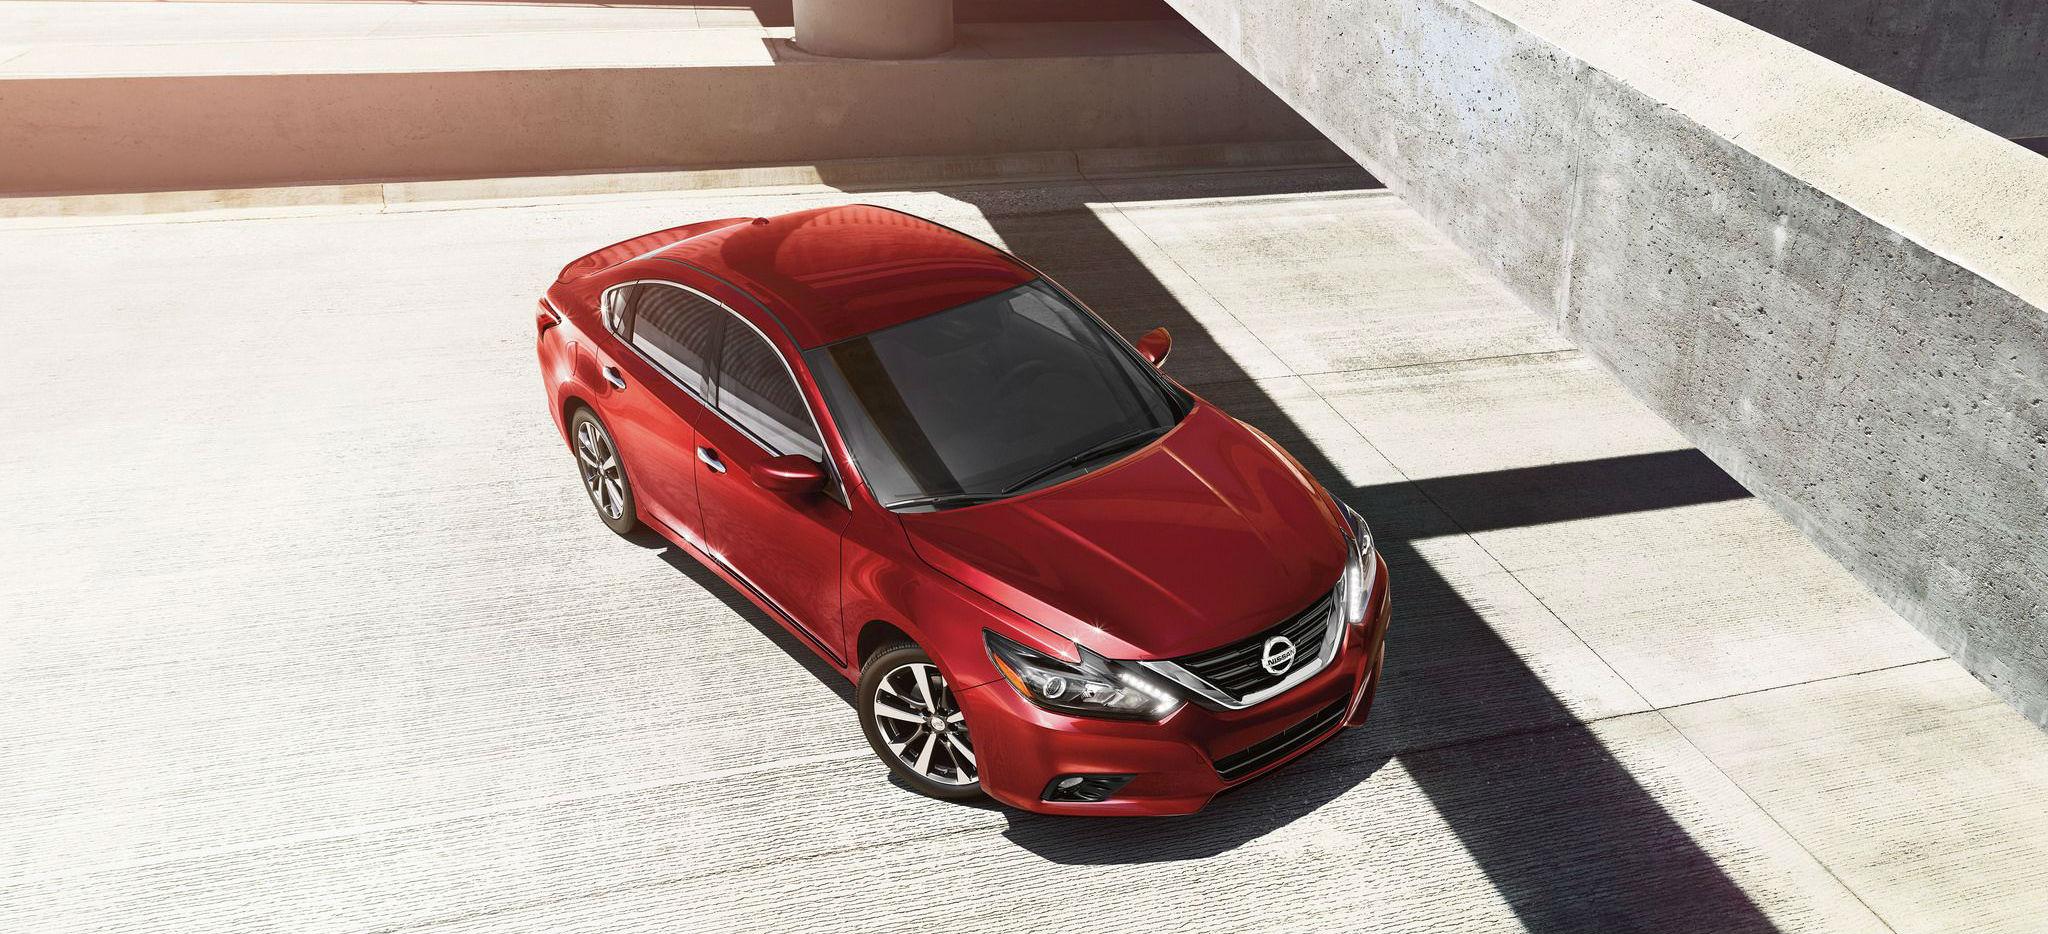 New Nissan Altima Price Quote Lake Charles, LA